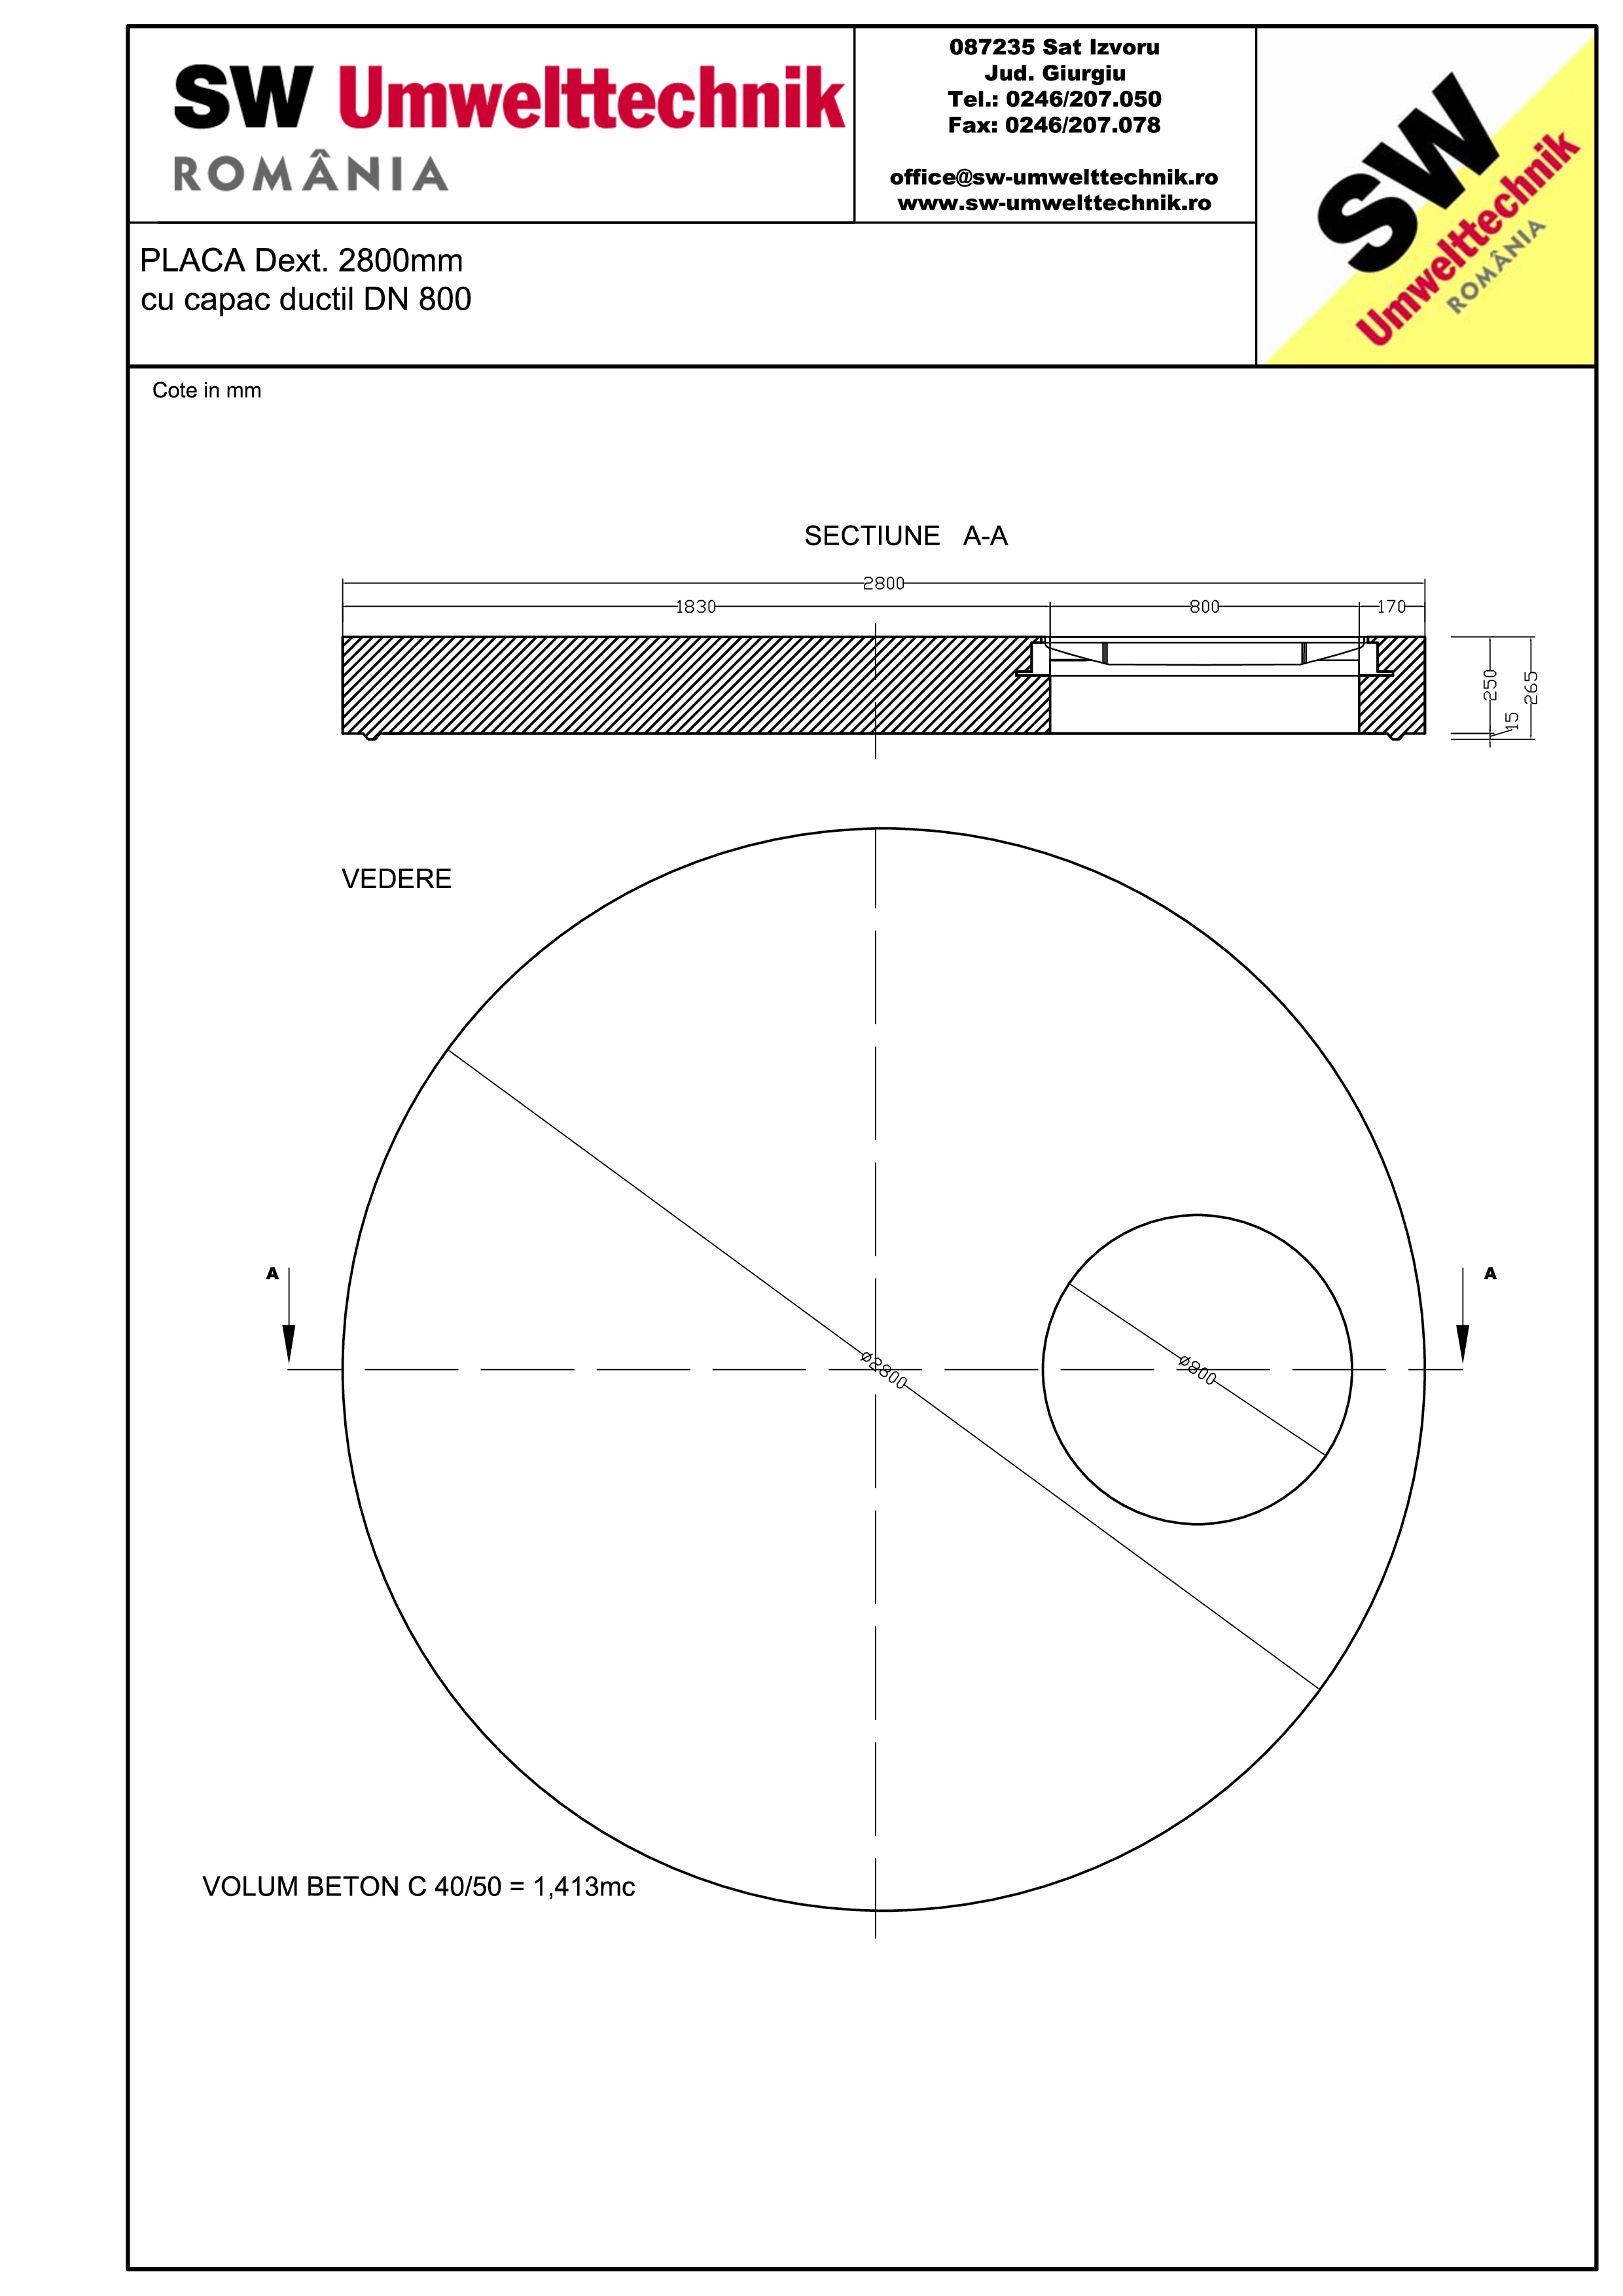 Pagina 1 - CAD-PDF Placa Dext. 2800 H250 cu capac ductil DN800 SW UMWELTTECHNIK Detaliu de produs